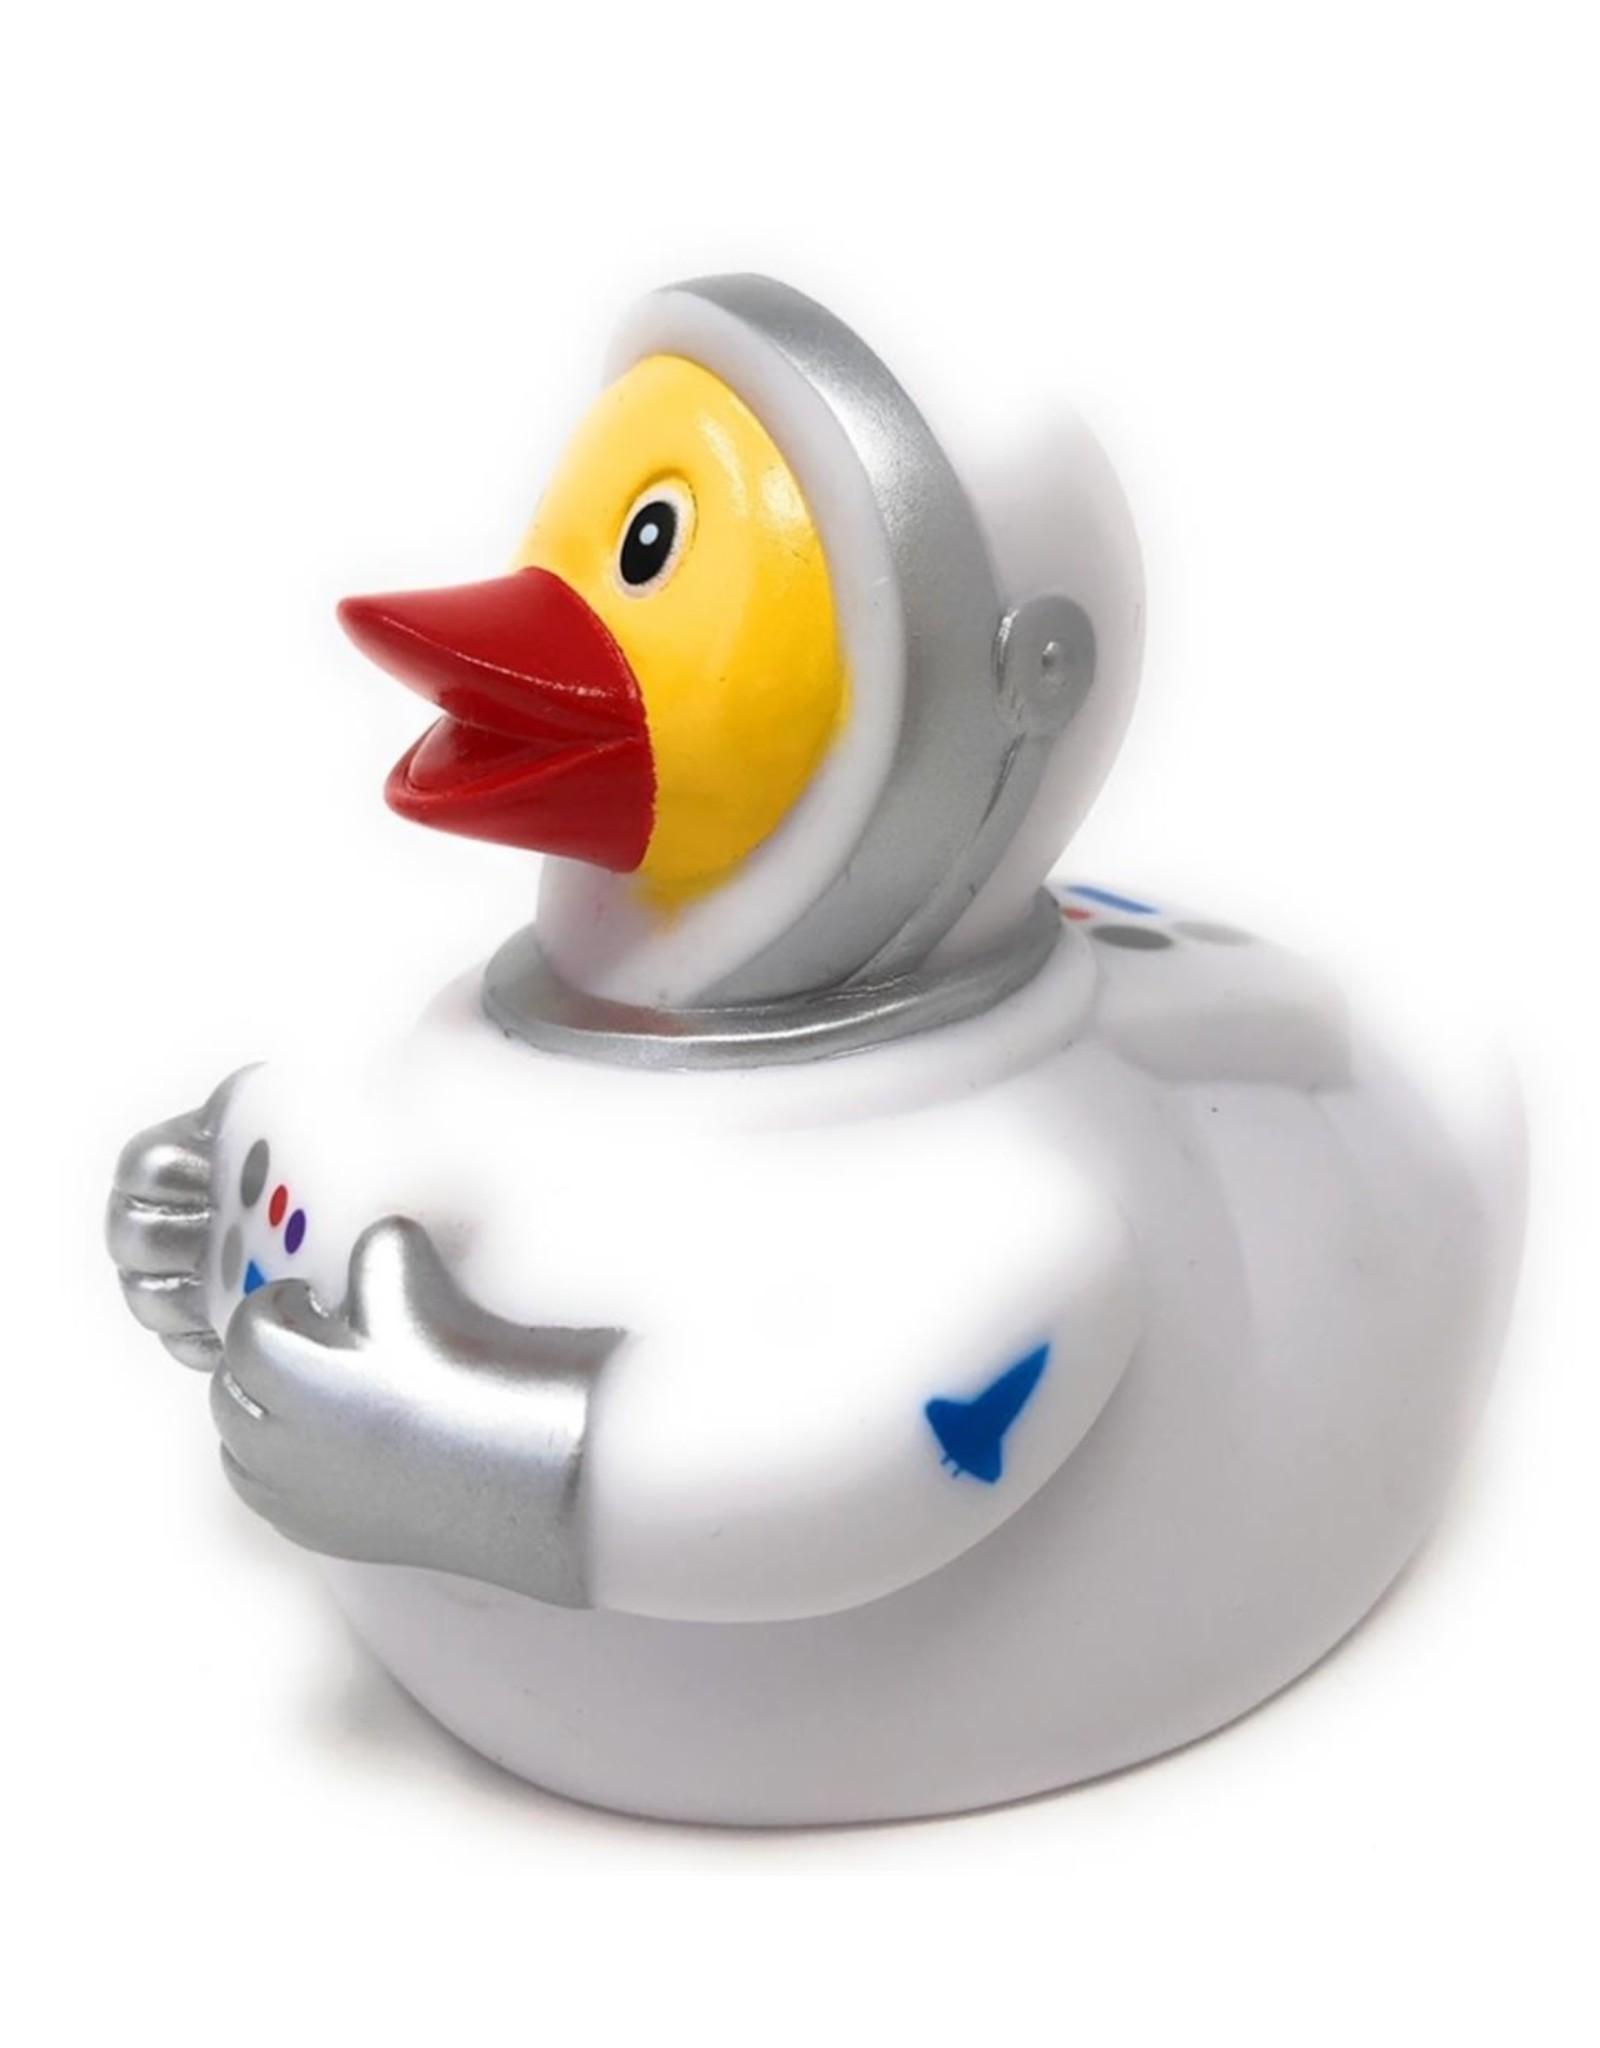 Astronaut Rubber Duck